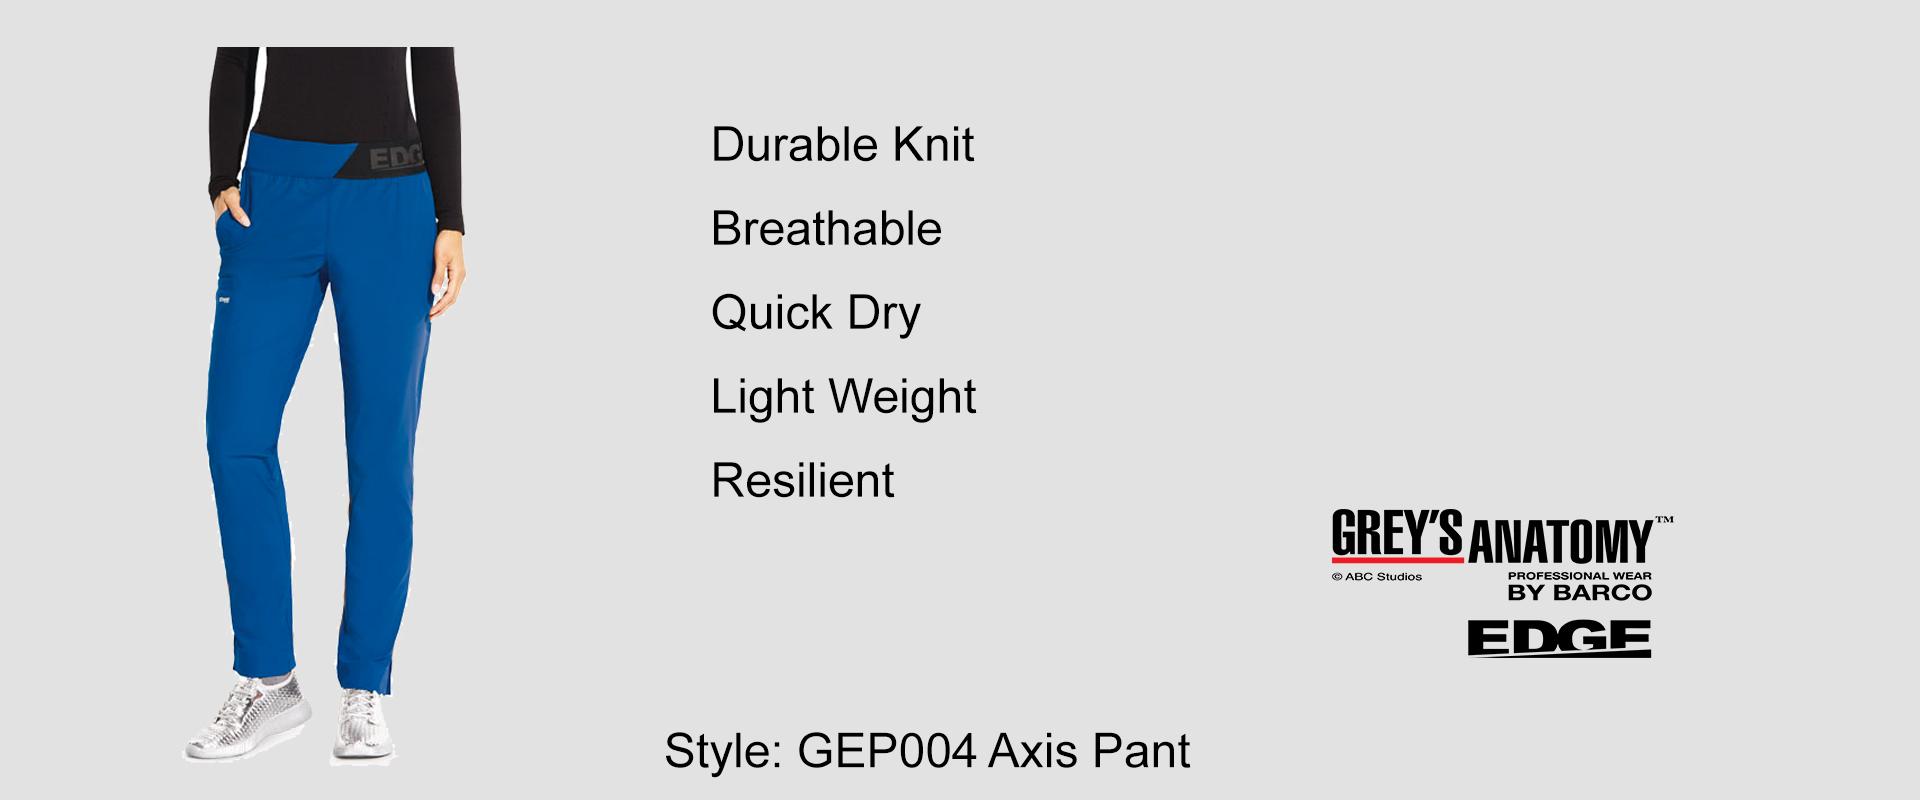 EDGE Axis Pant